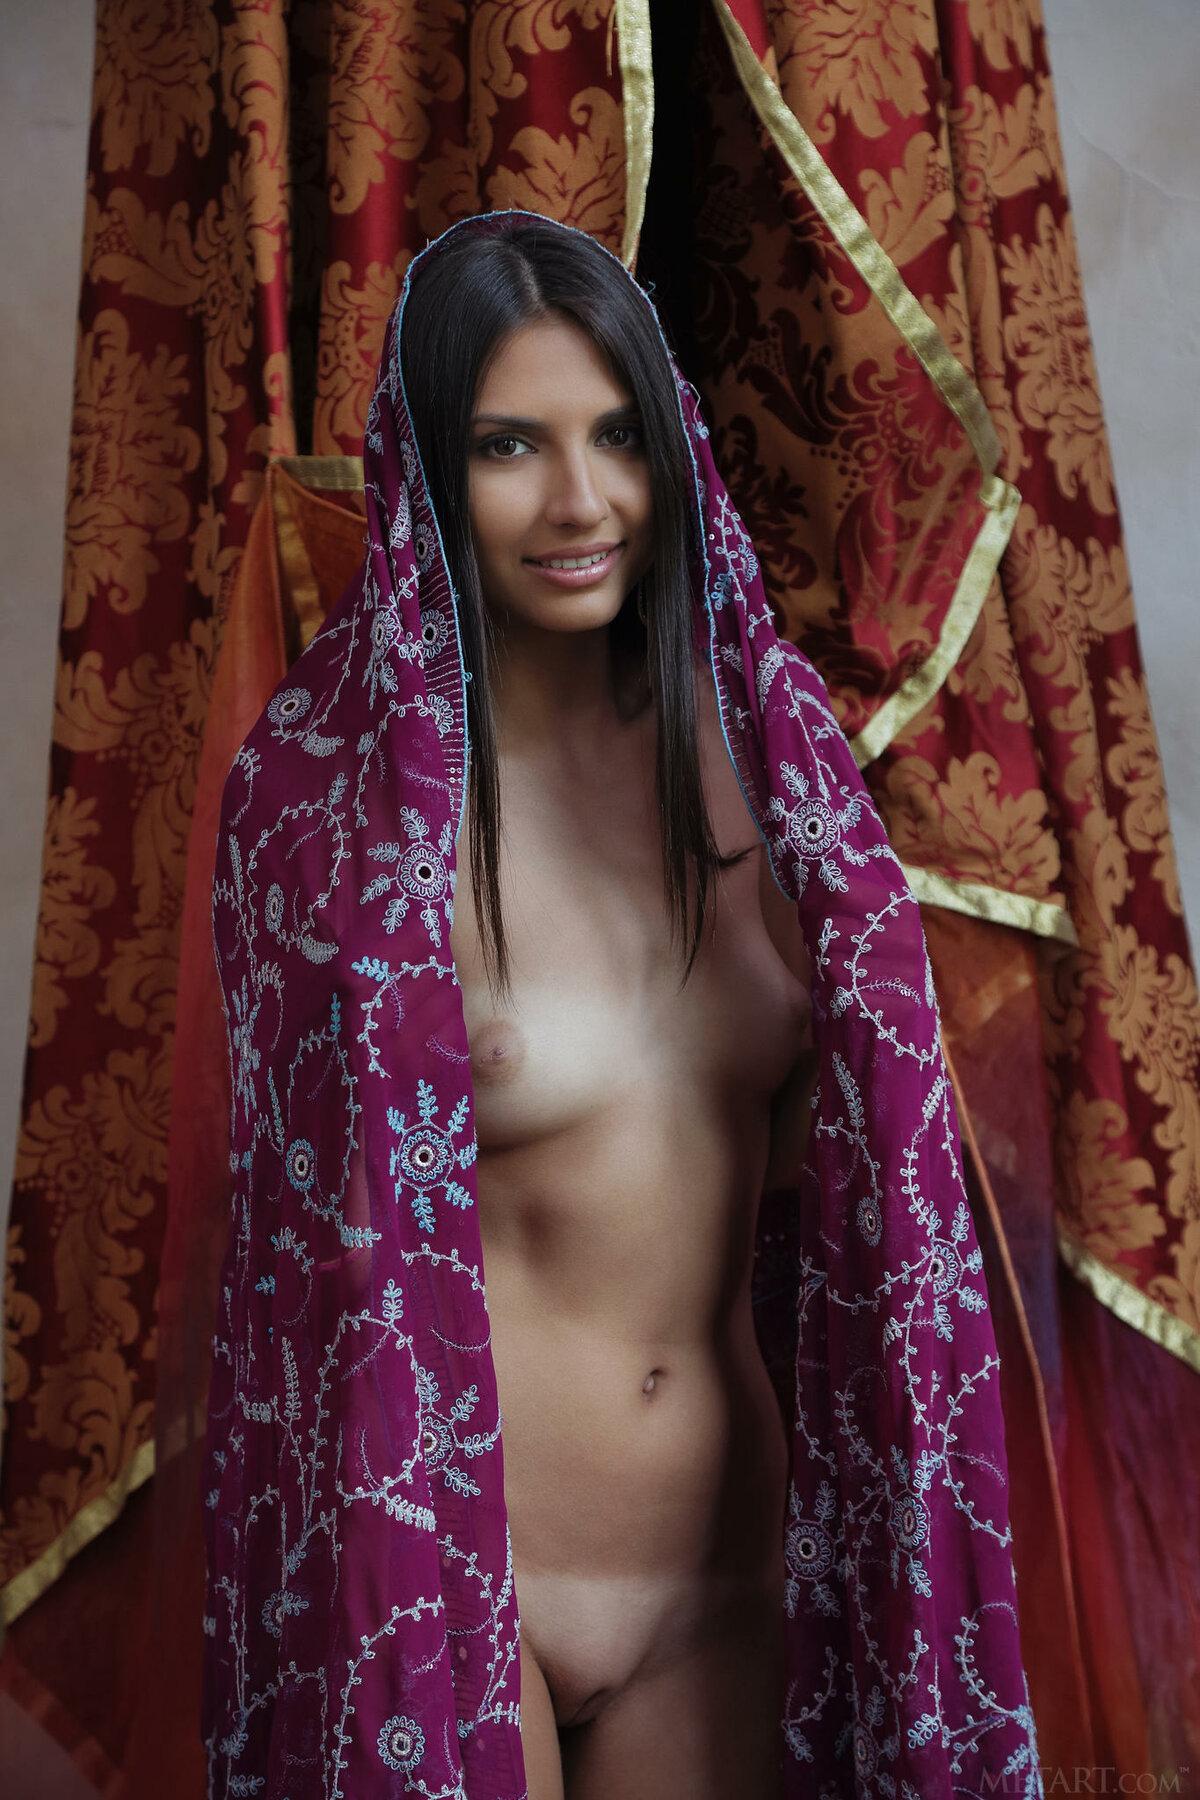 Arab naked art — photo 13